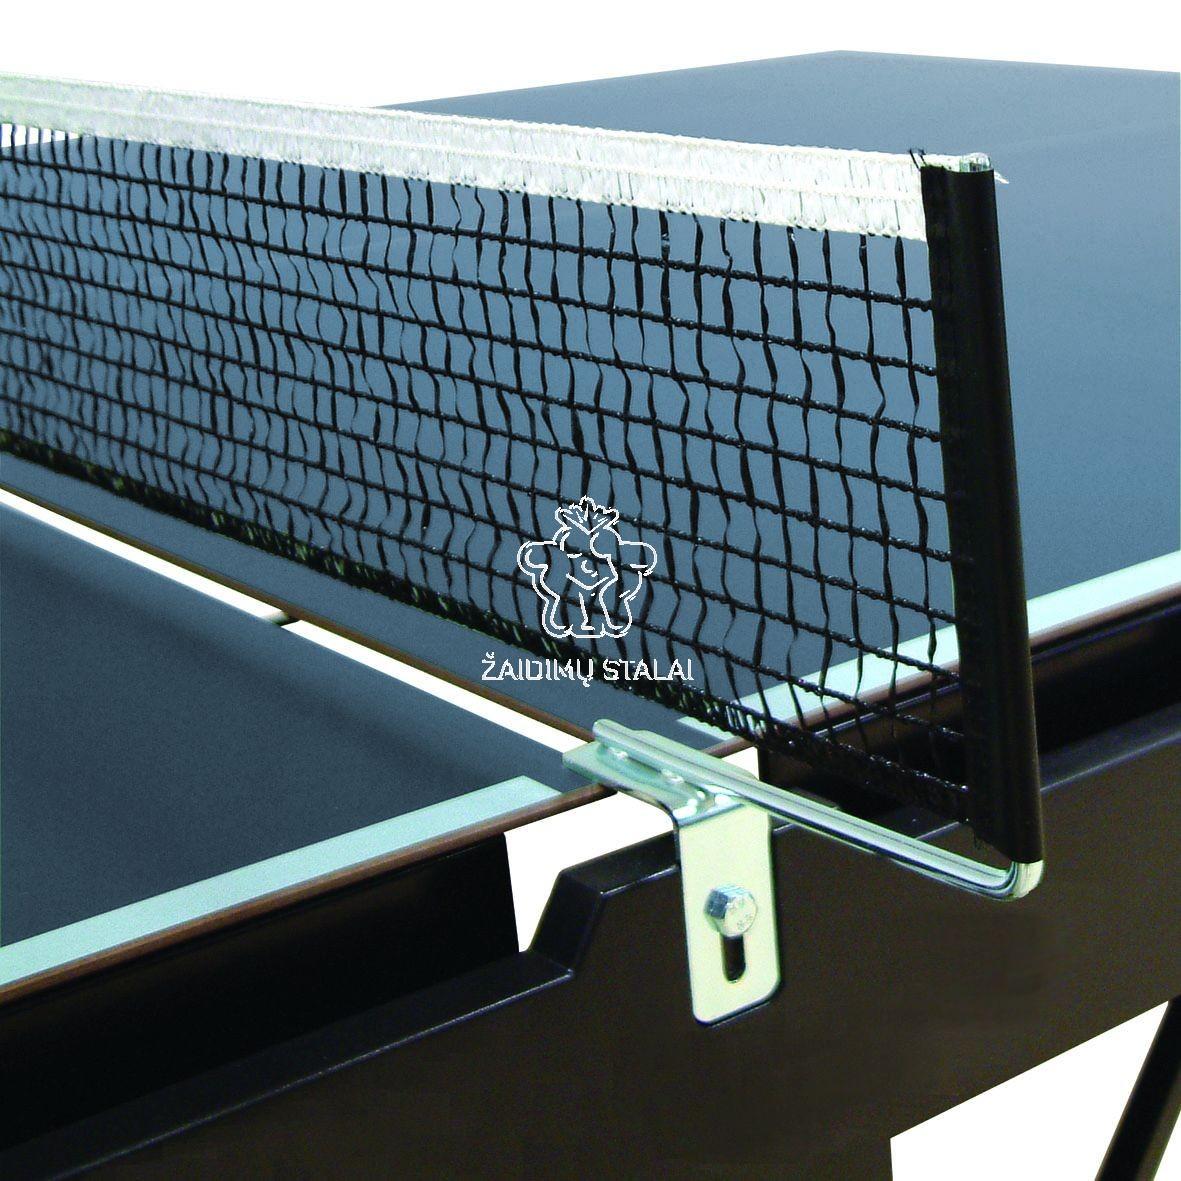 Stalo teniso tinkliuko rinkinys Sponeta Club-EN-Stationary